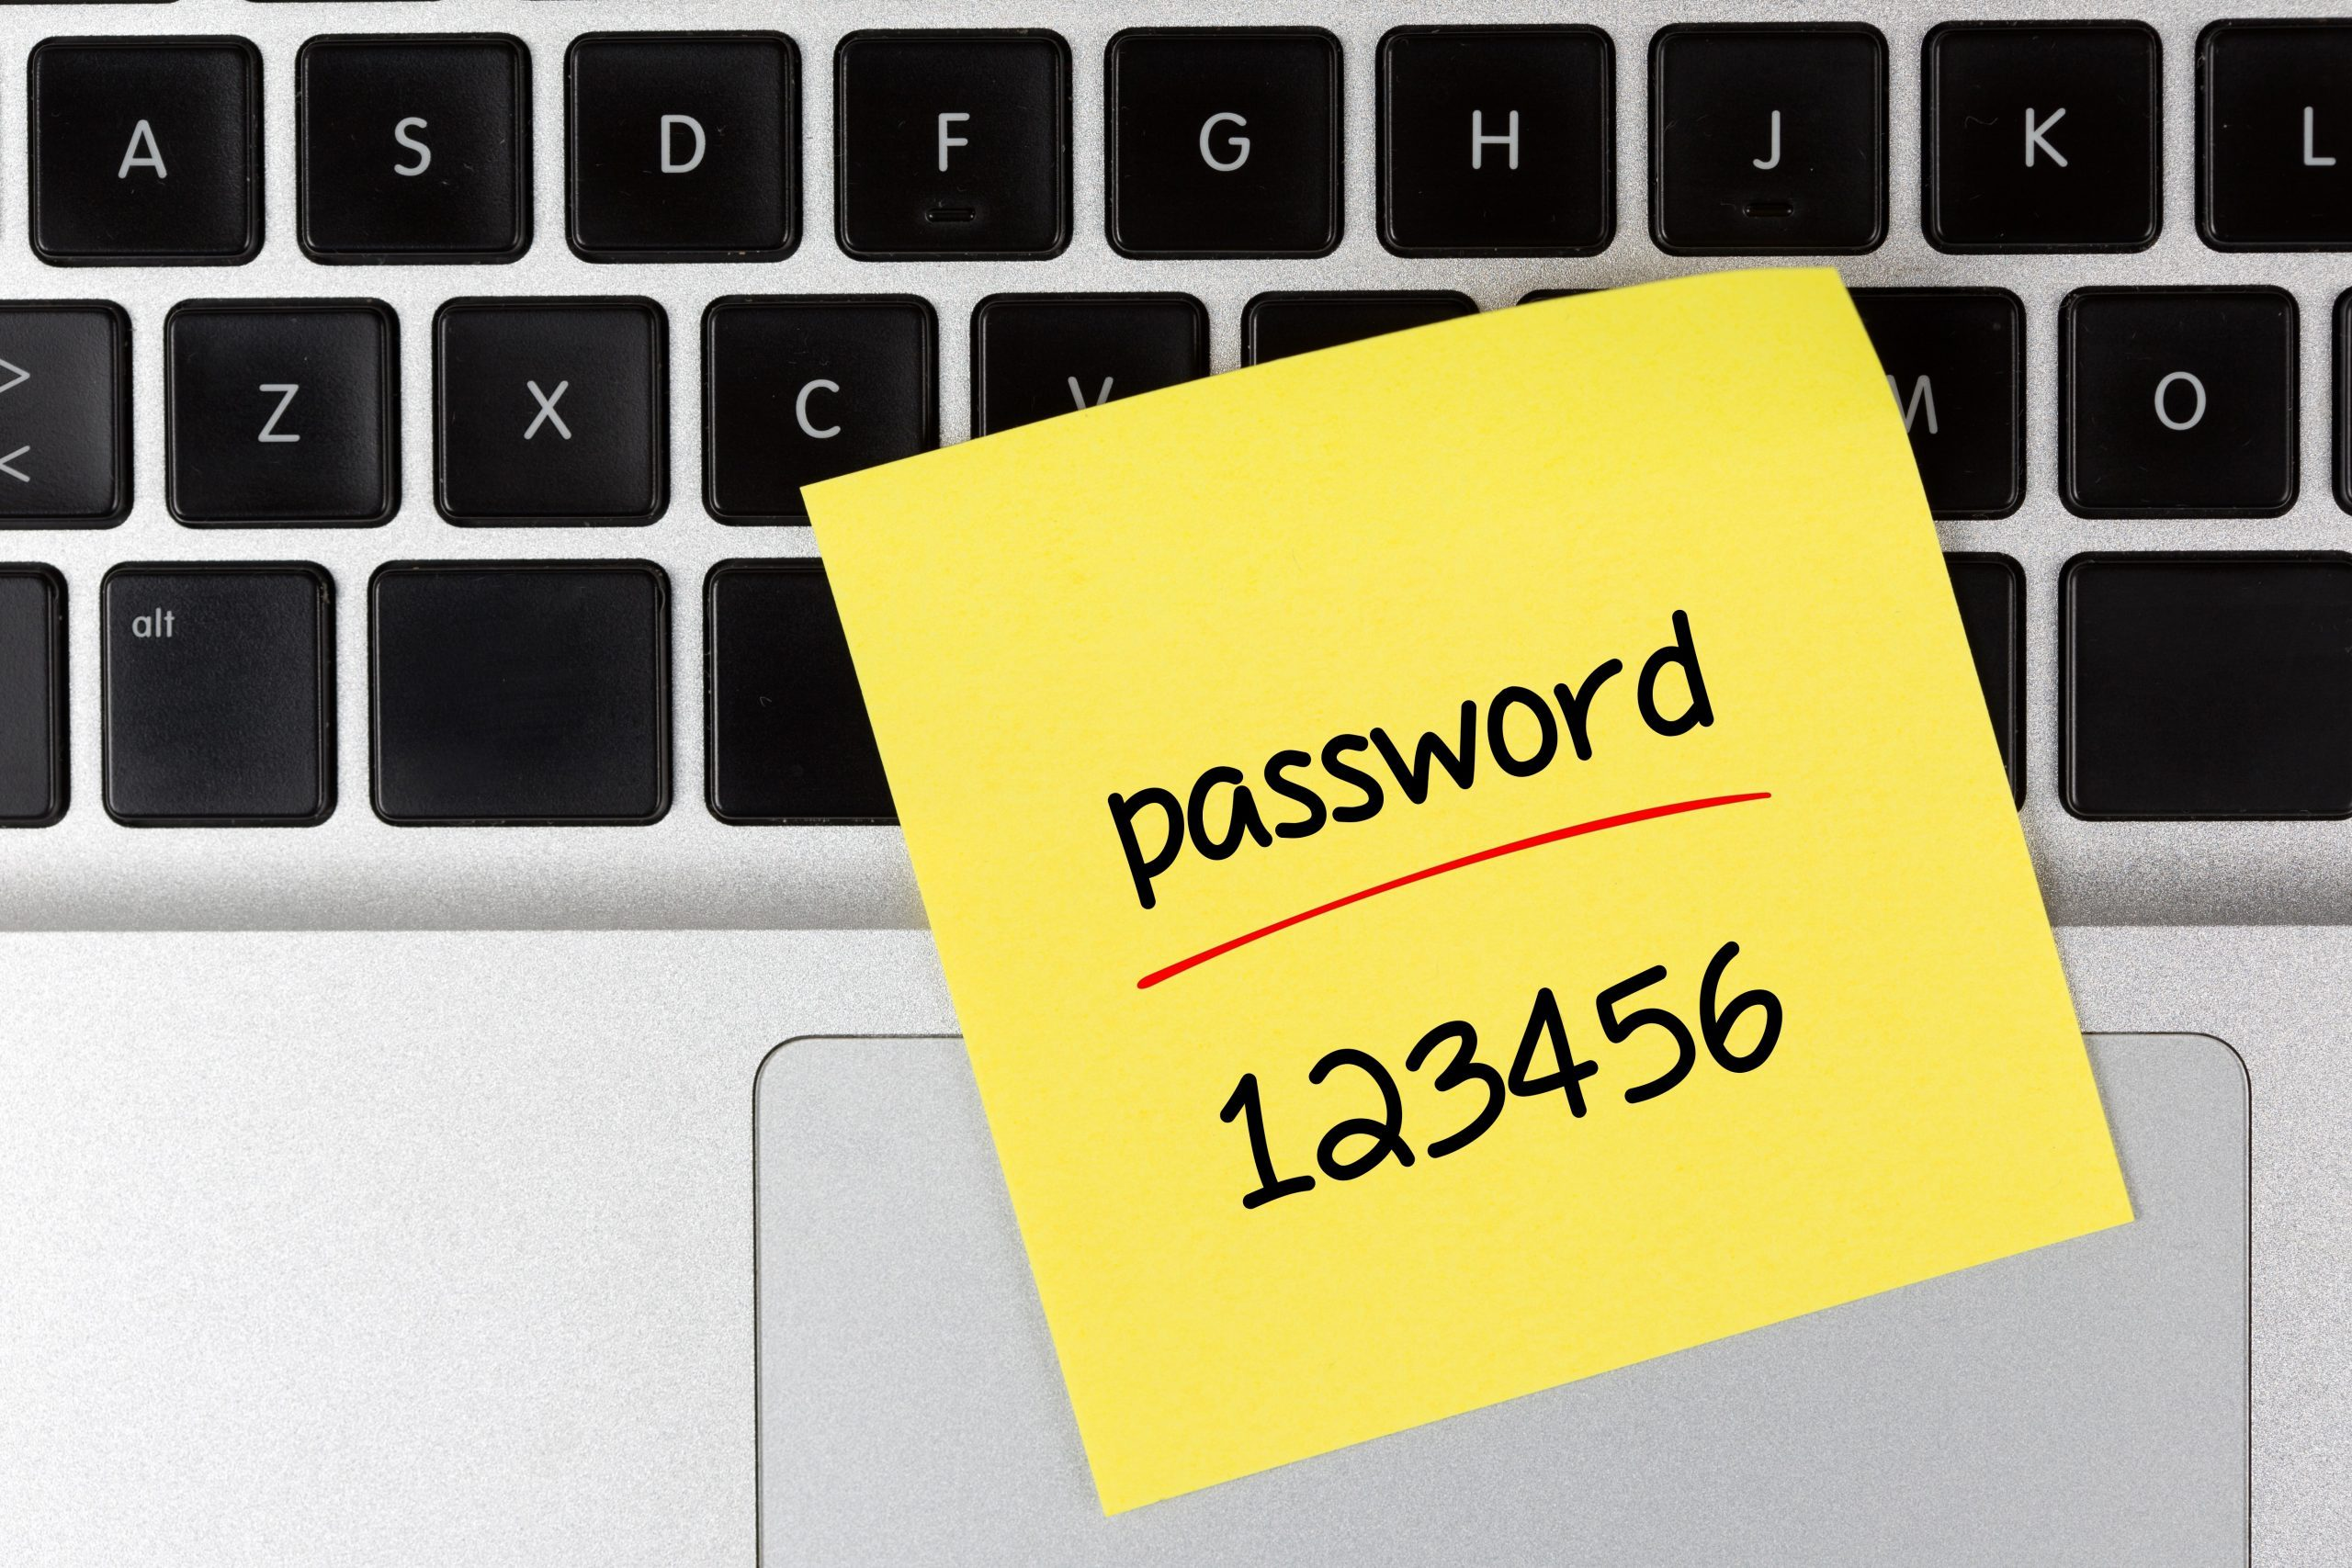 Easy Password Concept on Laptop